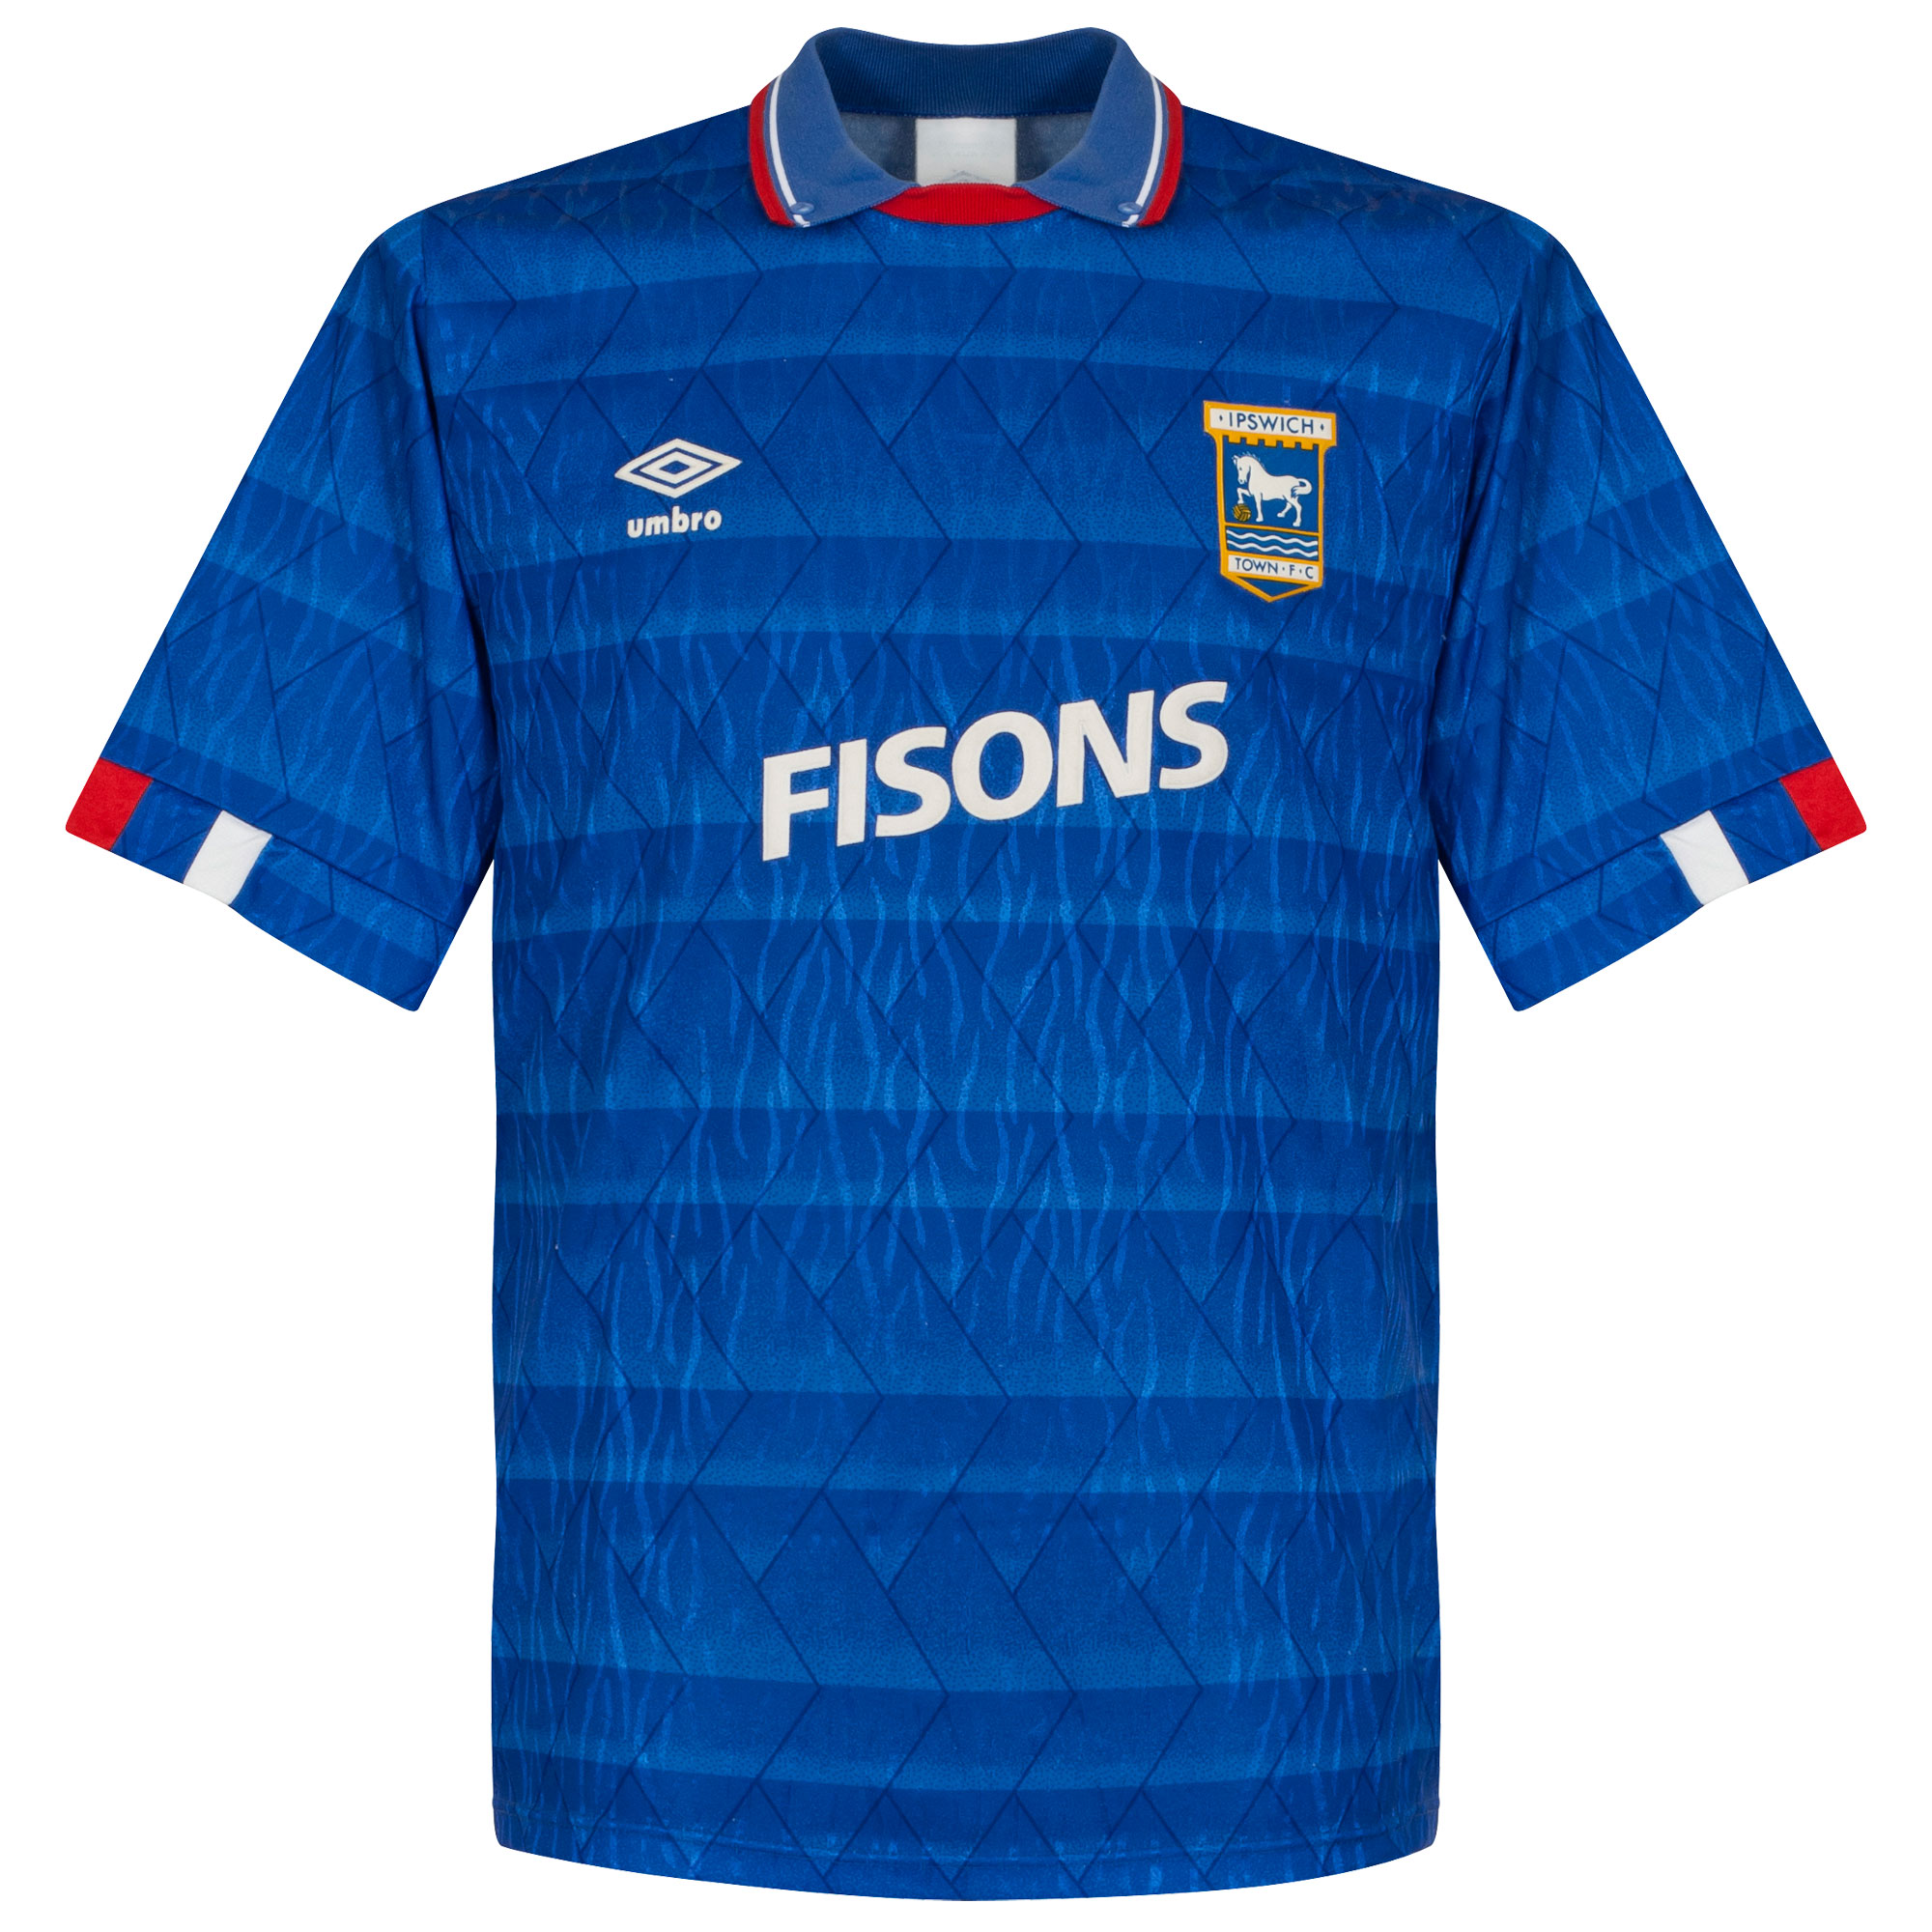 Ipswich Town  Home Shirt (Original)